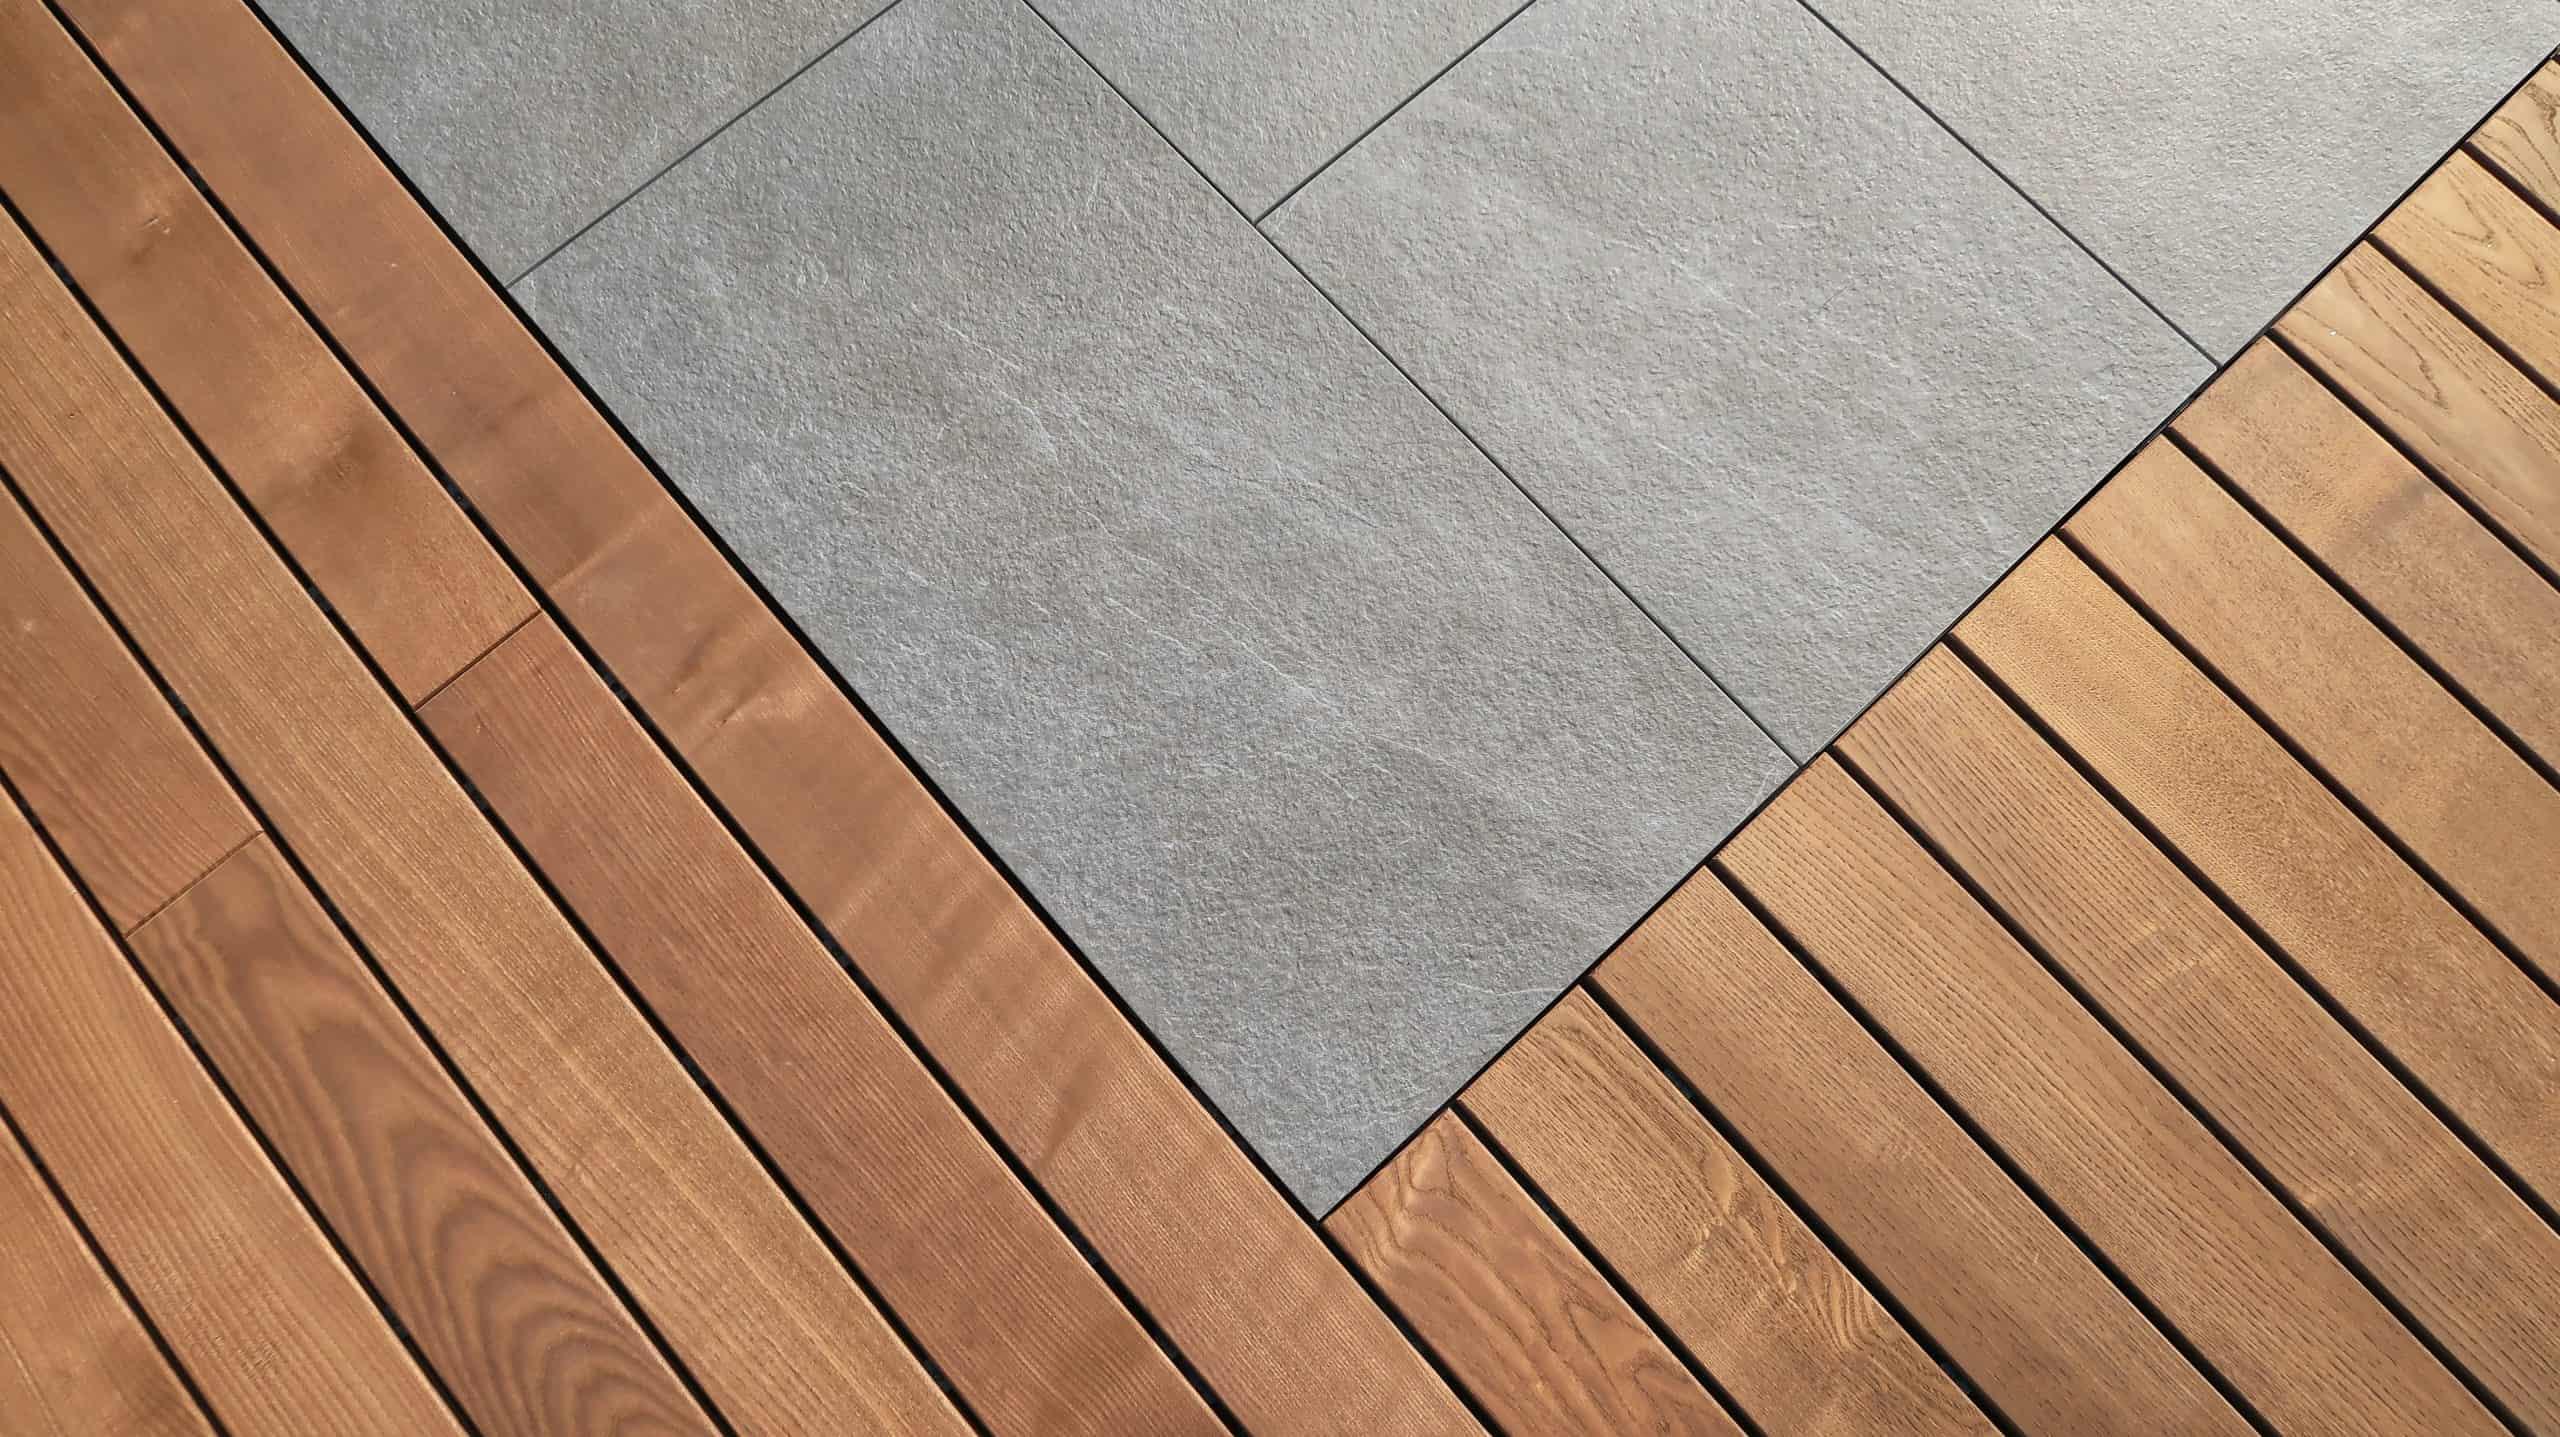 Terras of dakterras mooi opgebouwd met tegels en thermowood